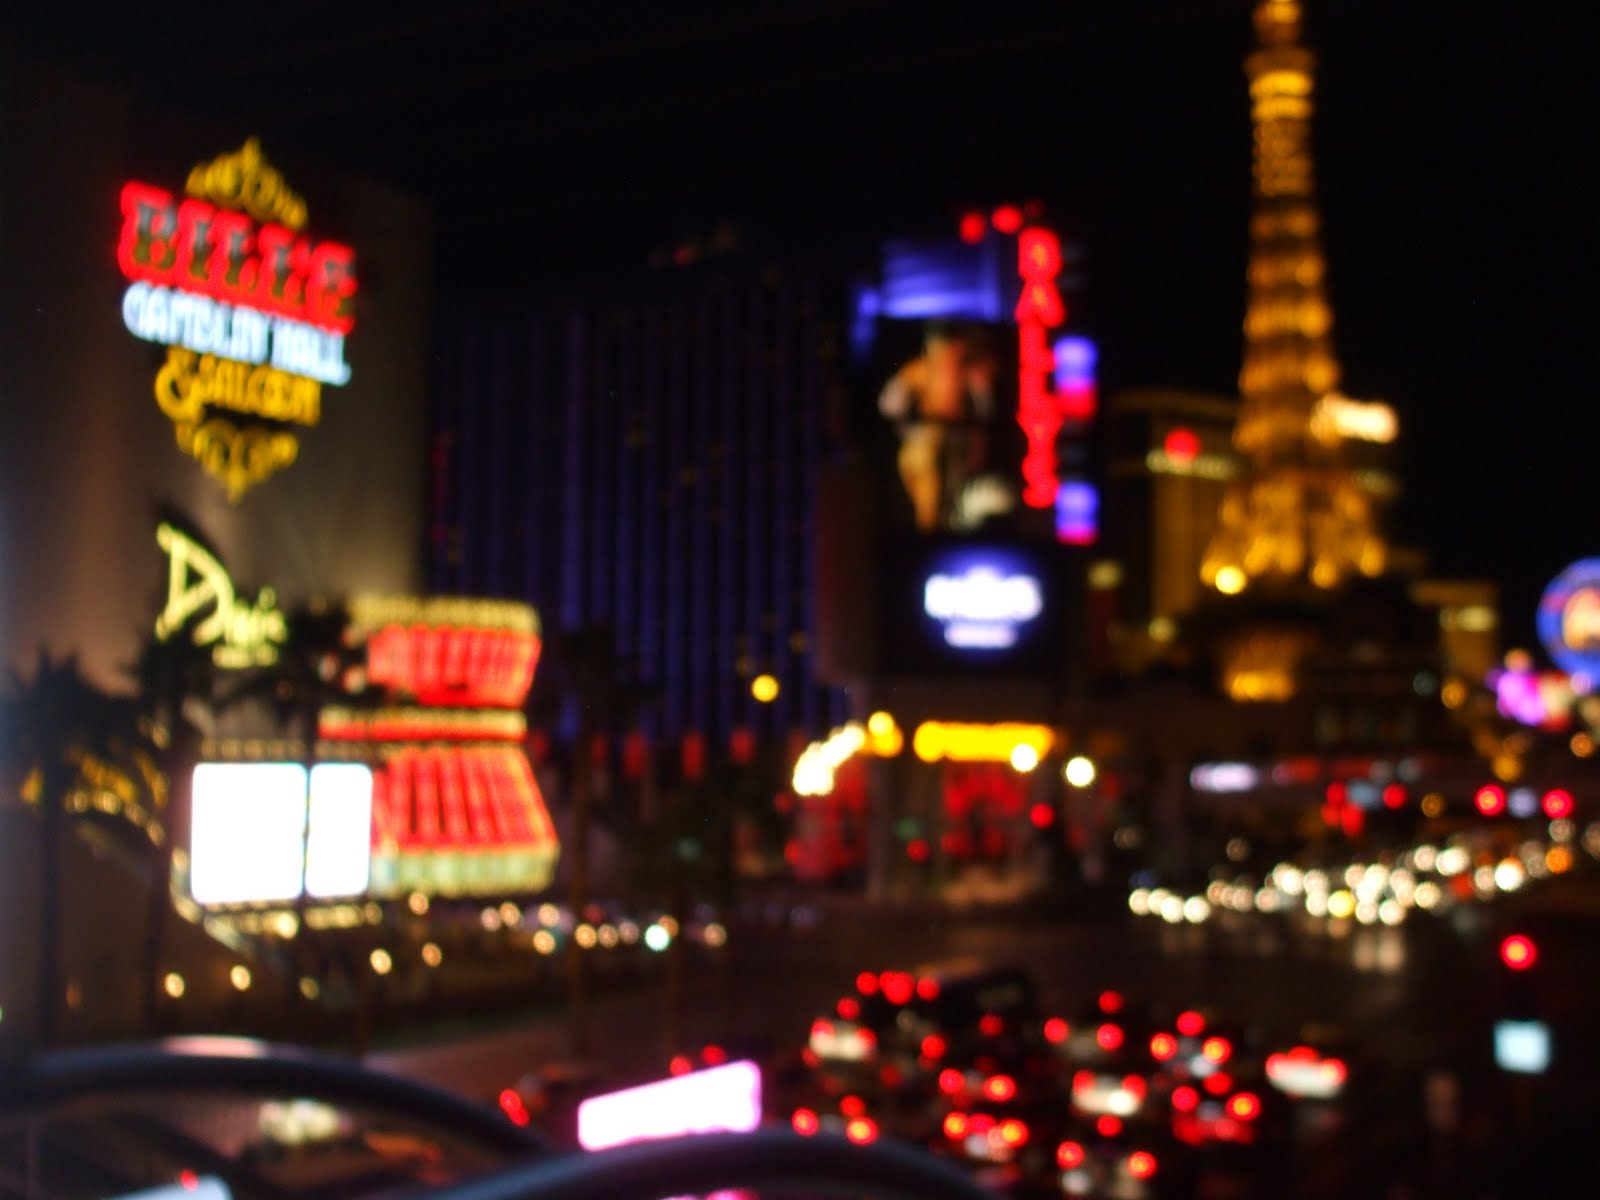 1.bp.blogspot.com__-dvsPmEluA0_SwgV36JPO5I_AAAAAAAAAYk_I0875D9i4Zs_s1600_Las+Vegas+2009+082